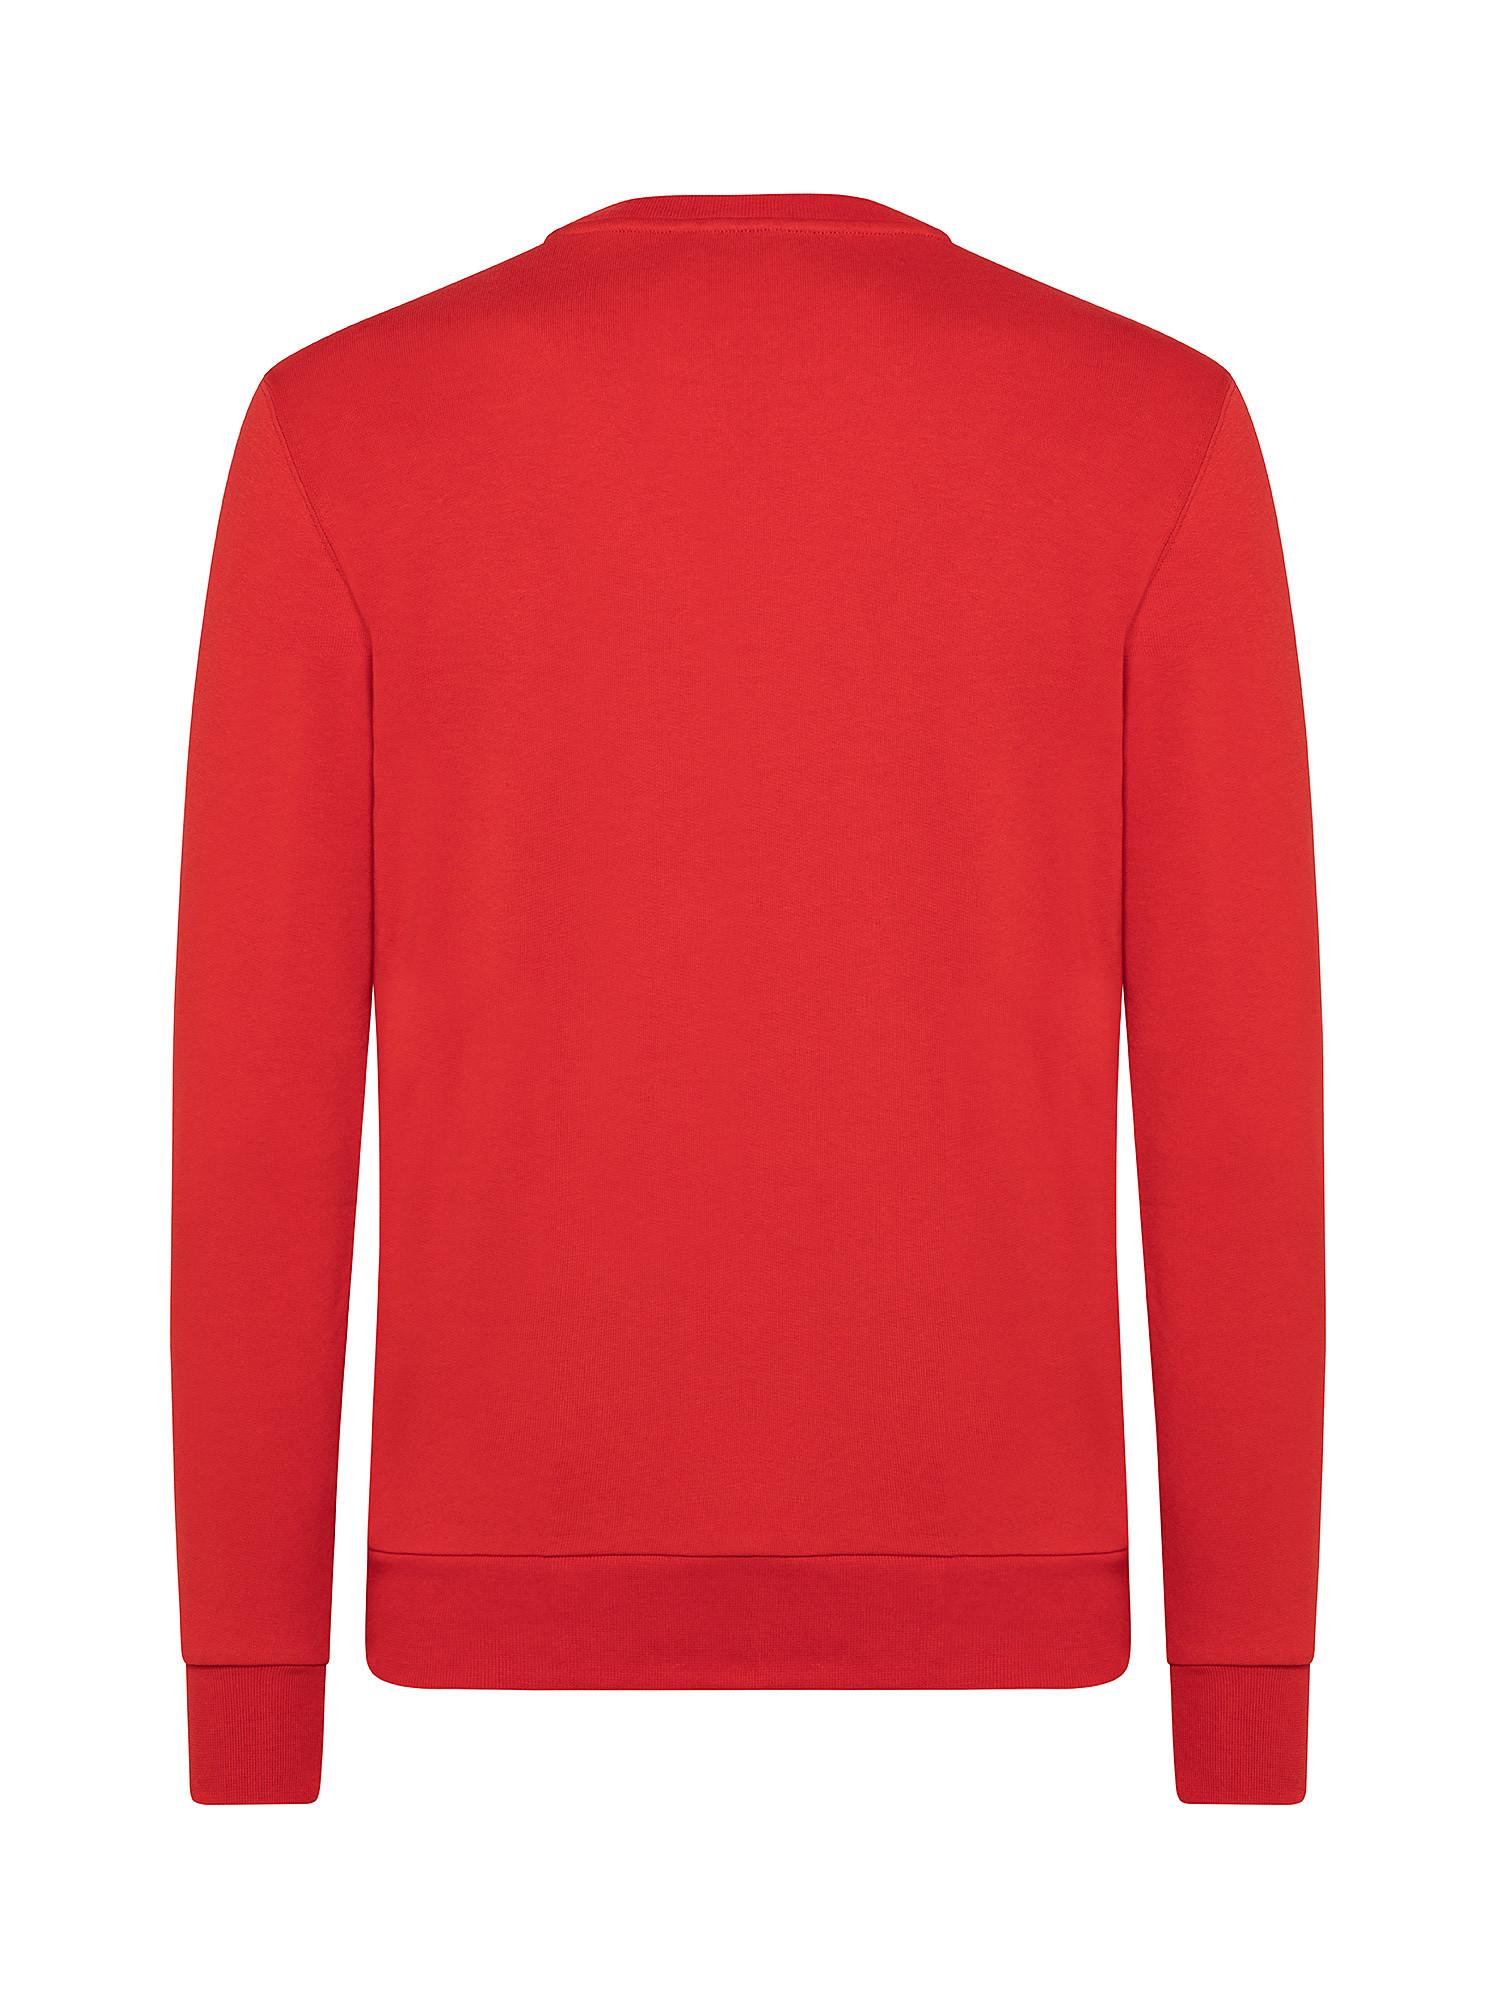 Felpa in cotone organico, Rosso, large image number 1